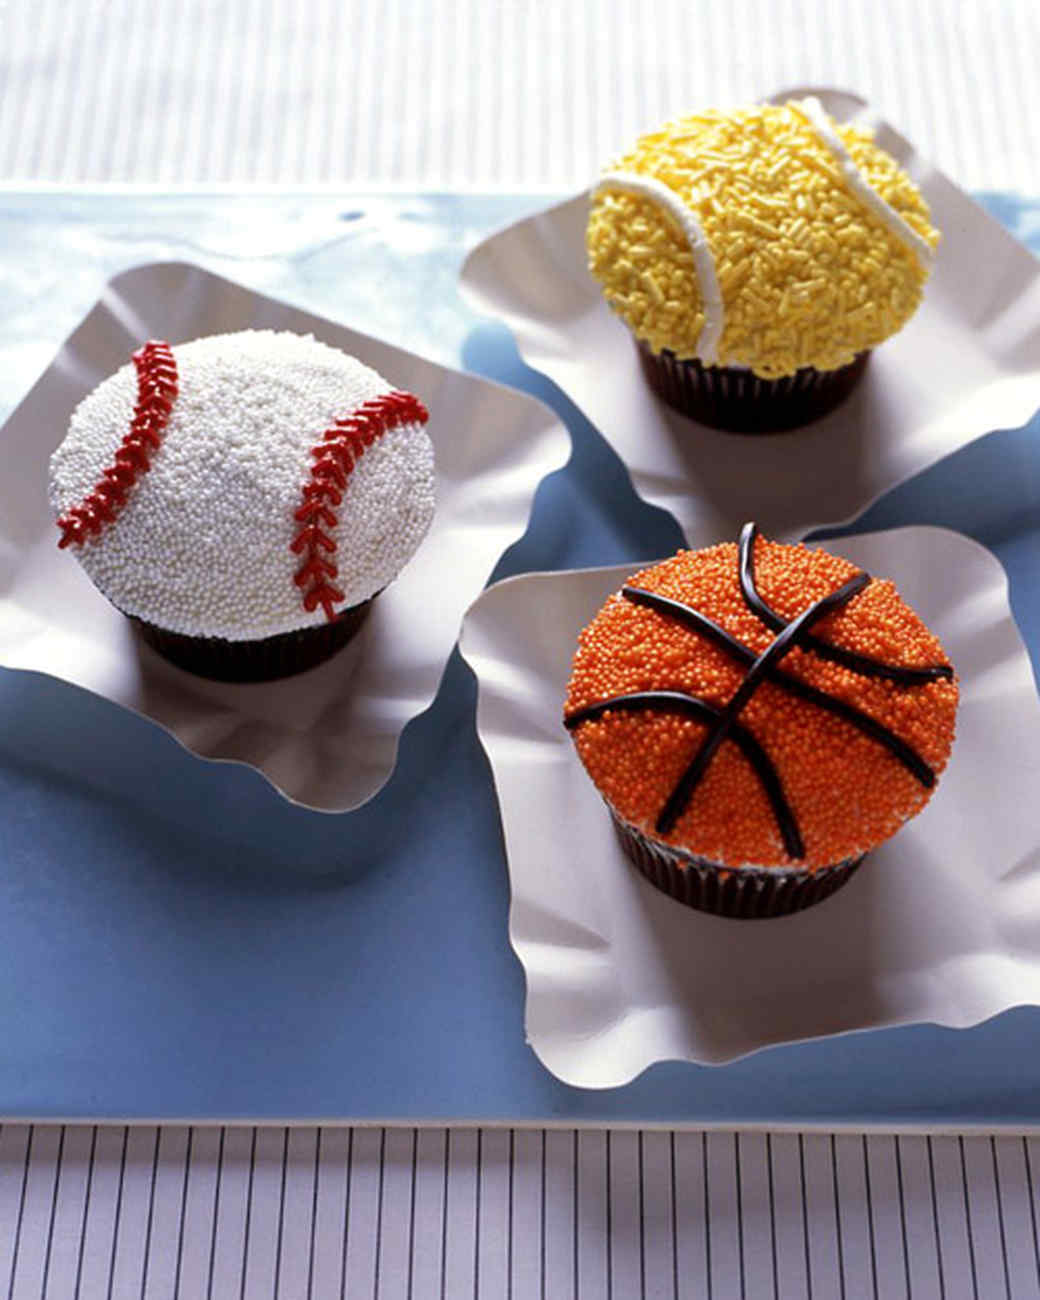 Home Run Cupcakes